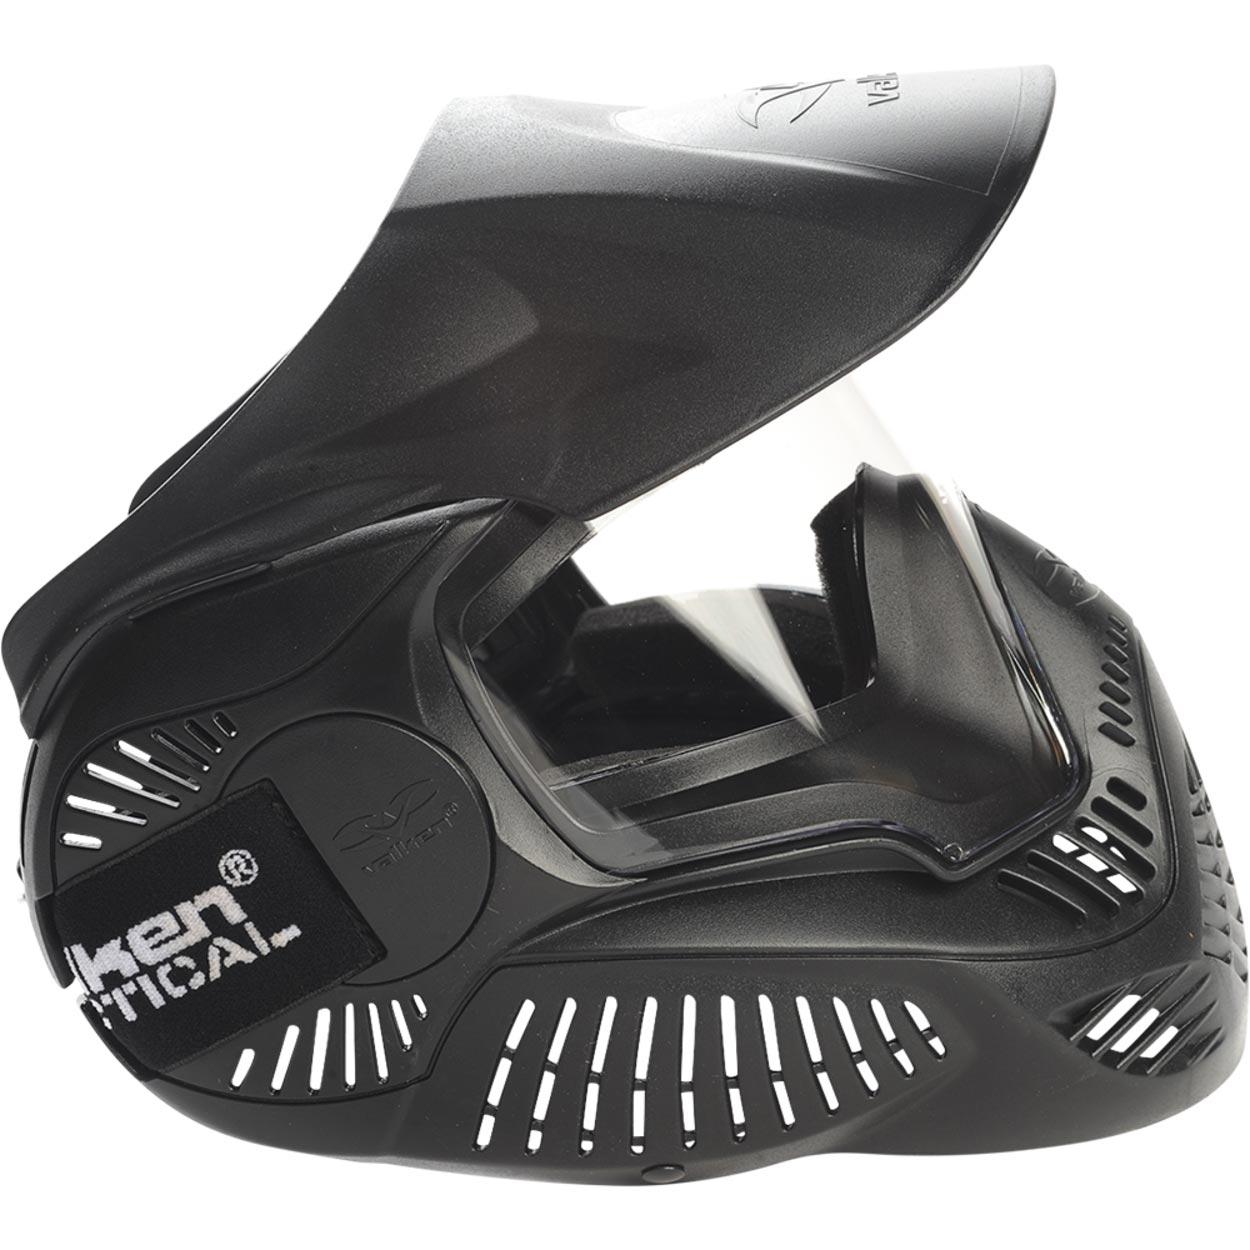 Valken MI 5 Bulk Goggles - Black